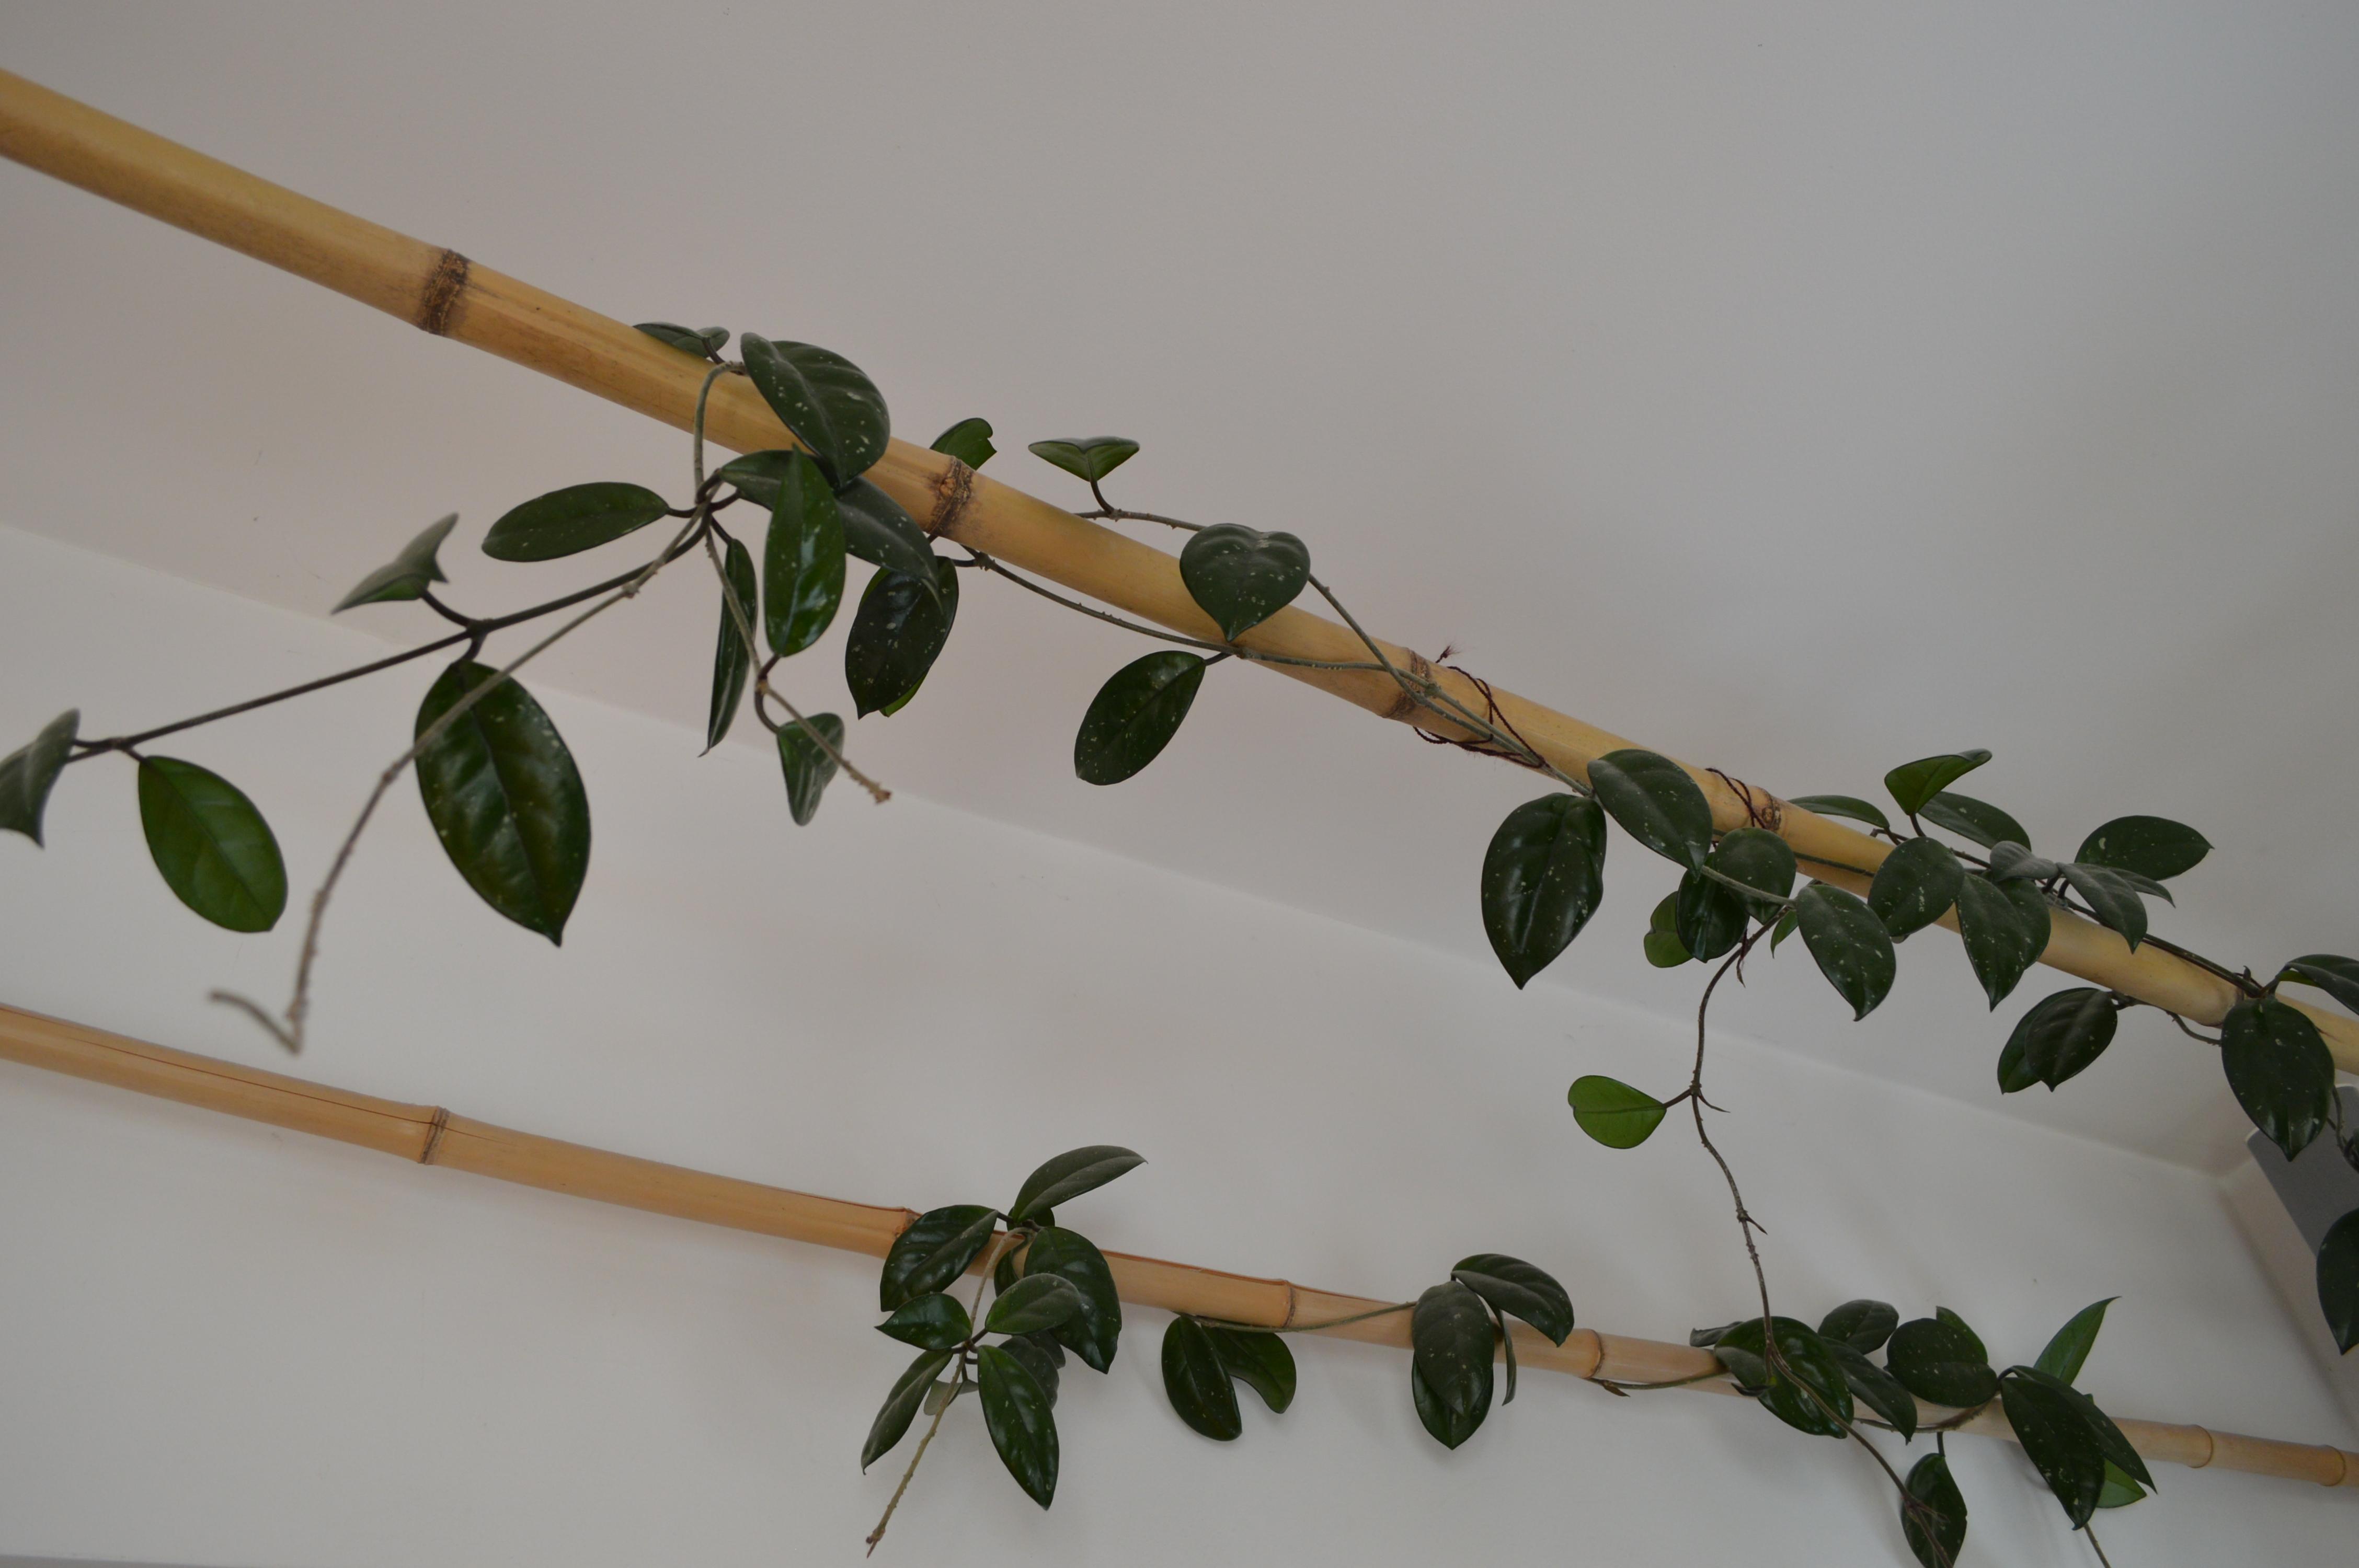 choja na bambusie